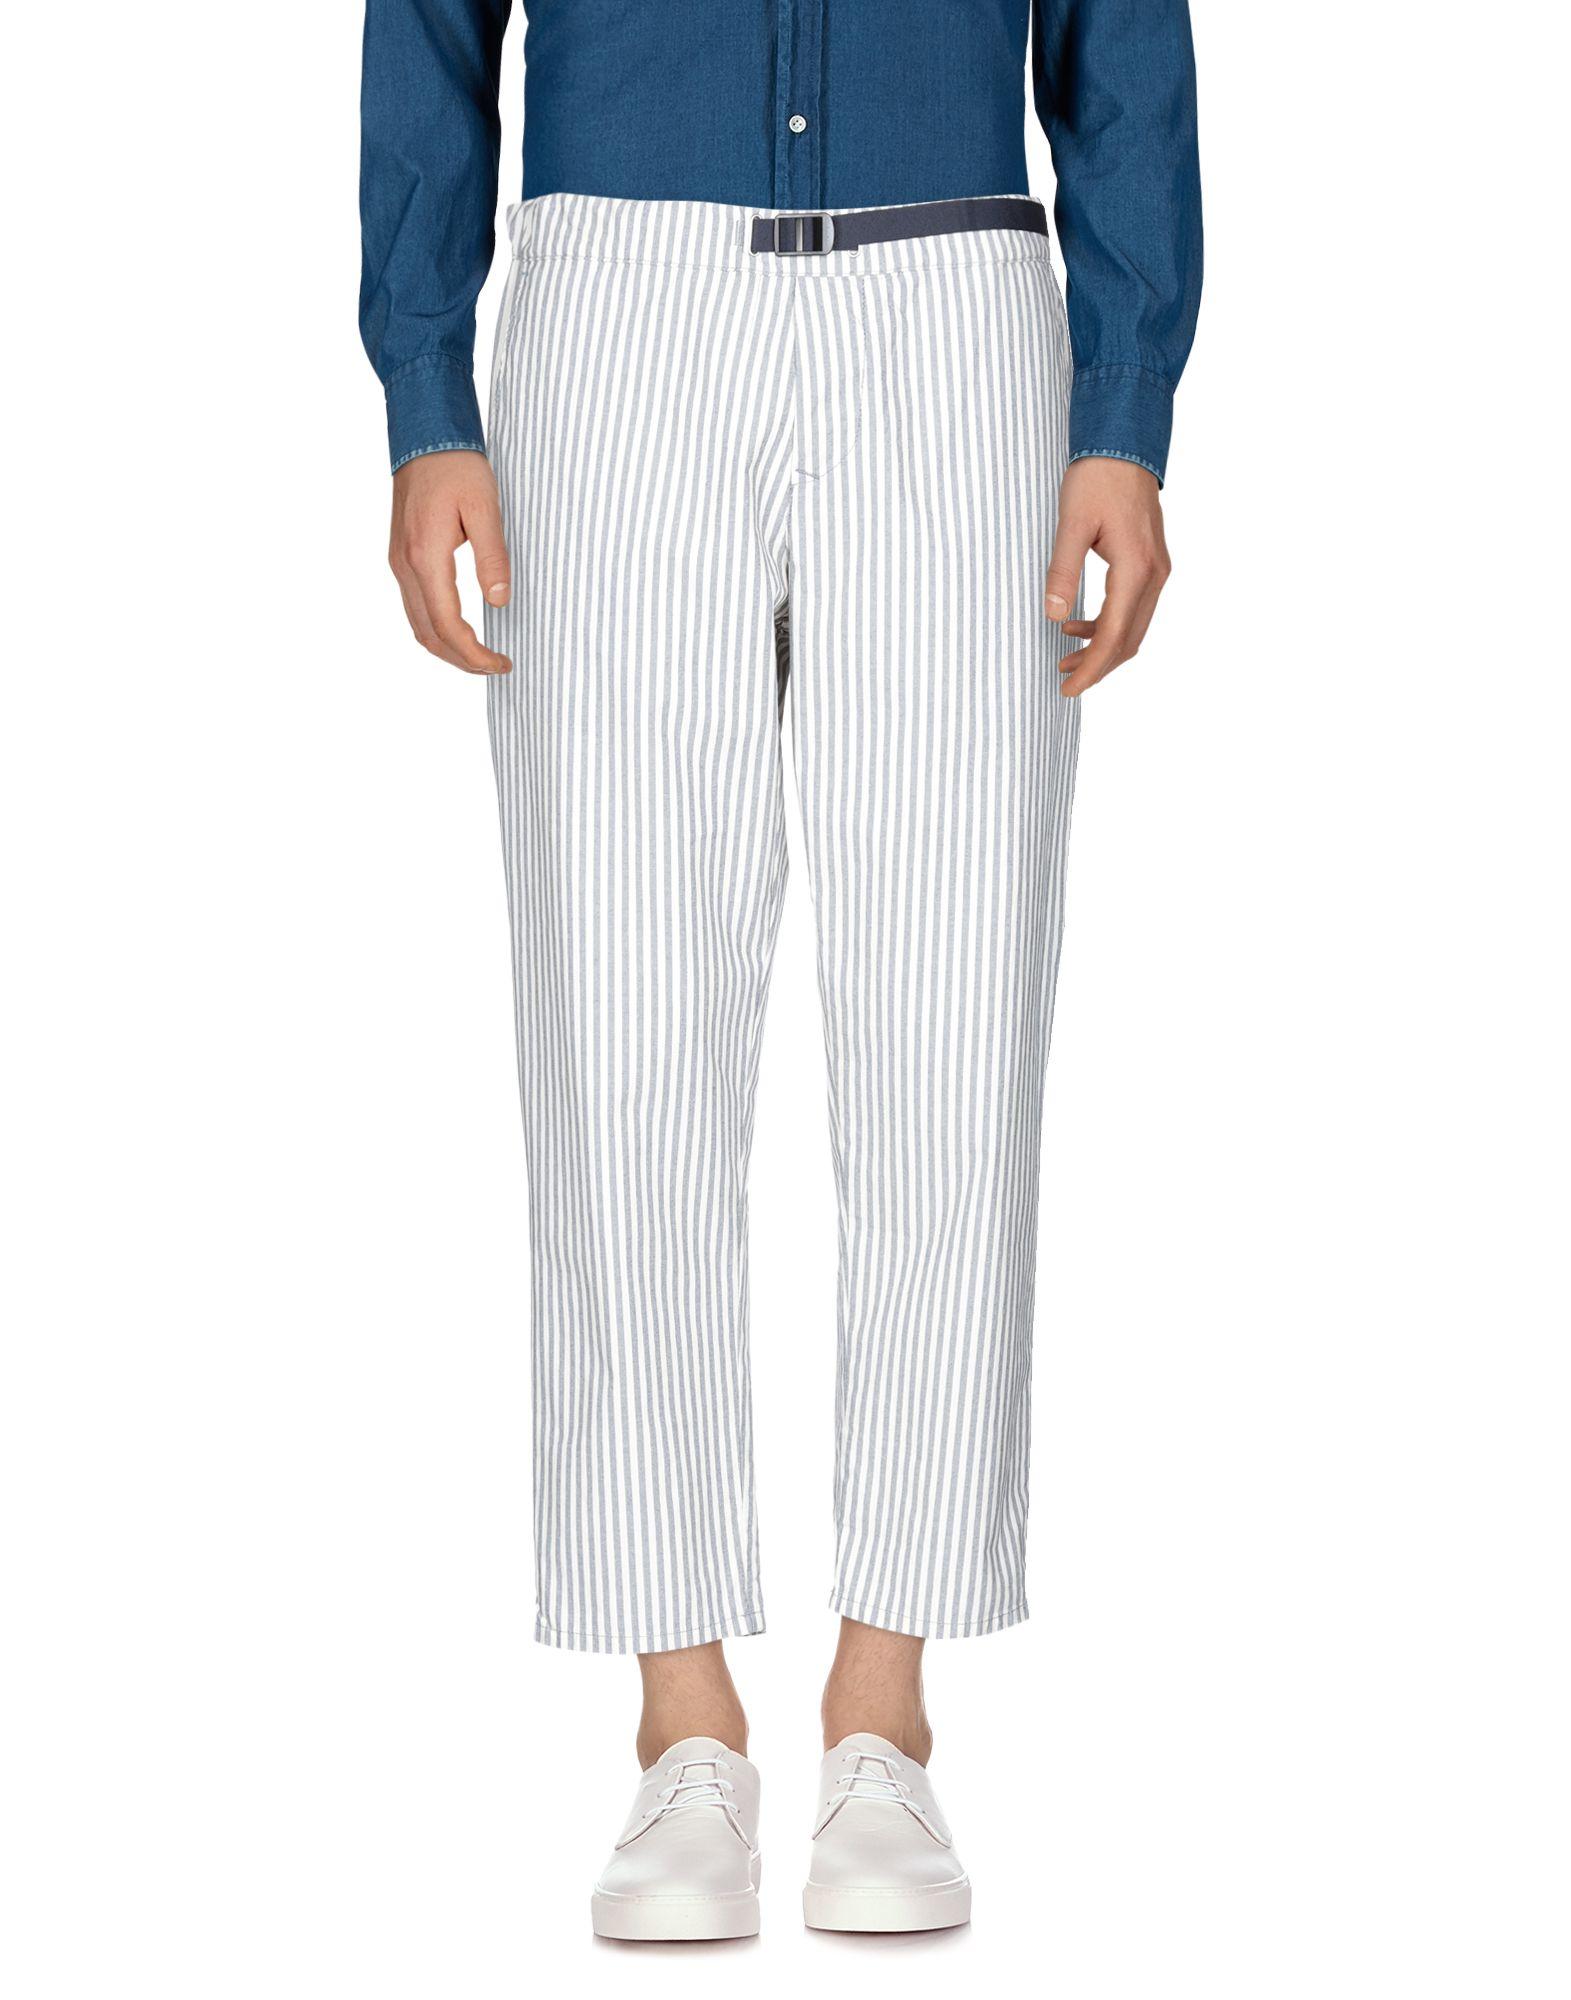 Pantalone Daniele Alessandrini Homme herren - 13218854HK